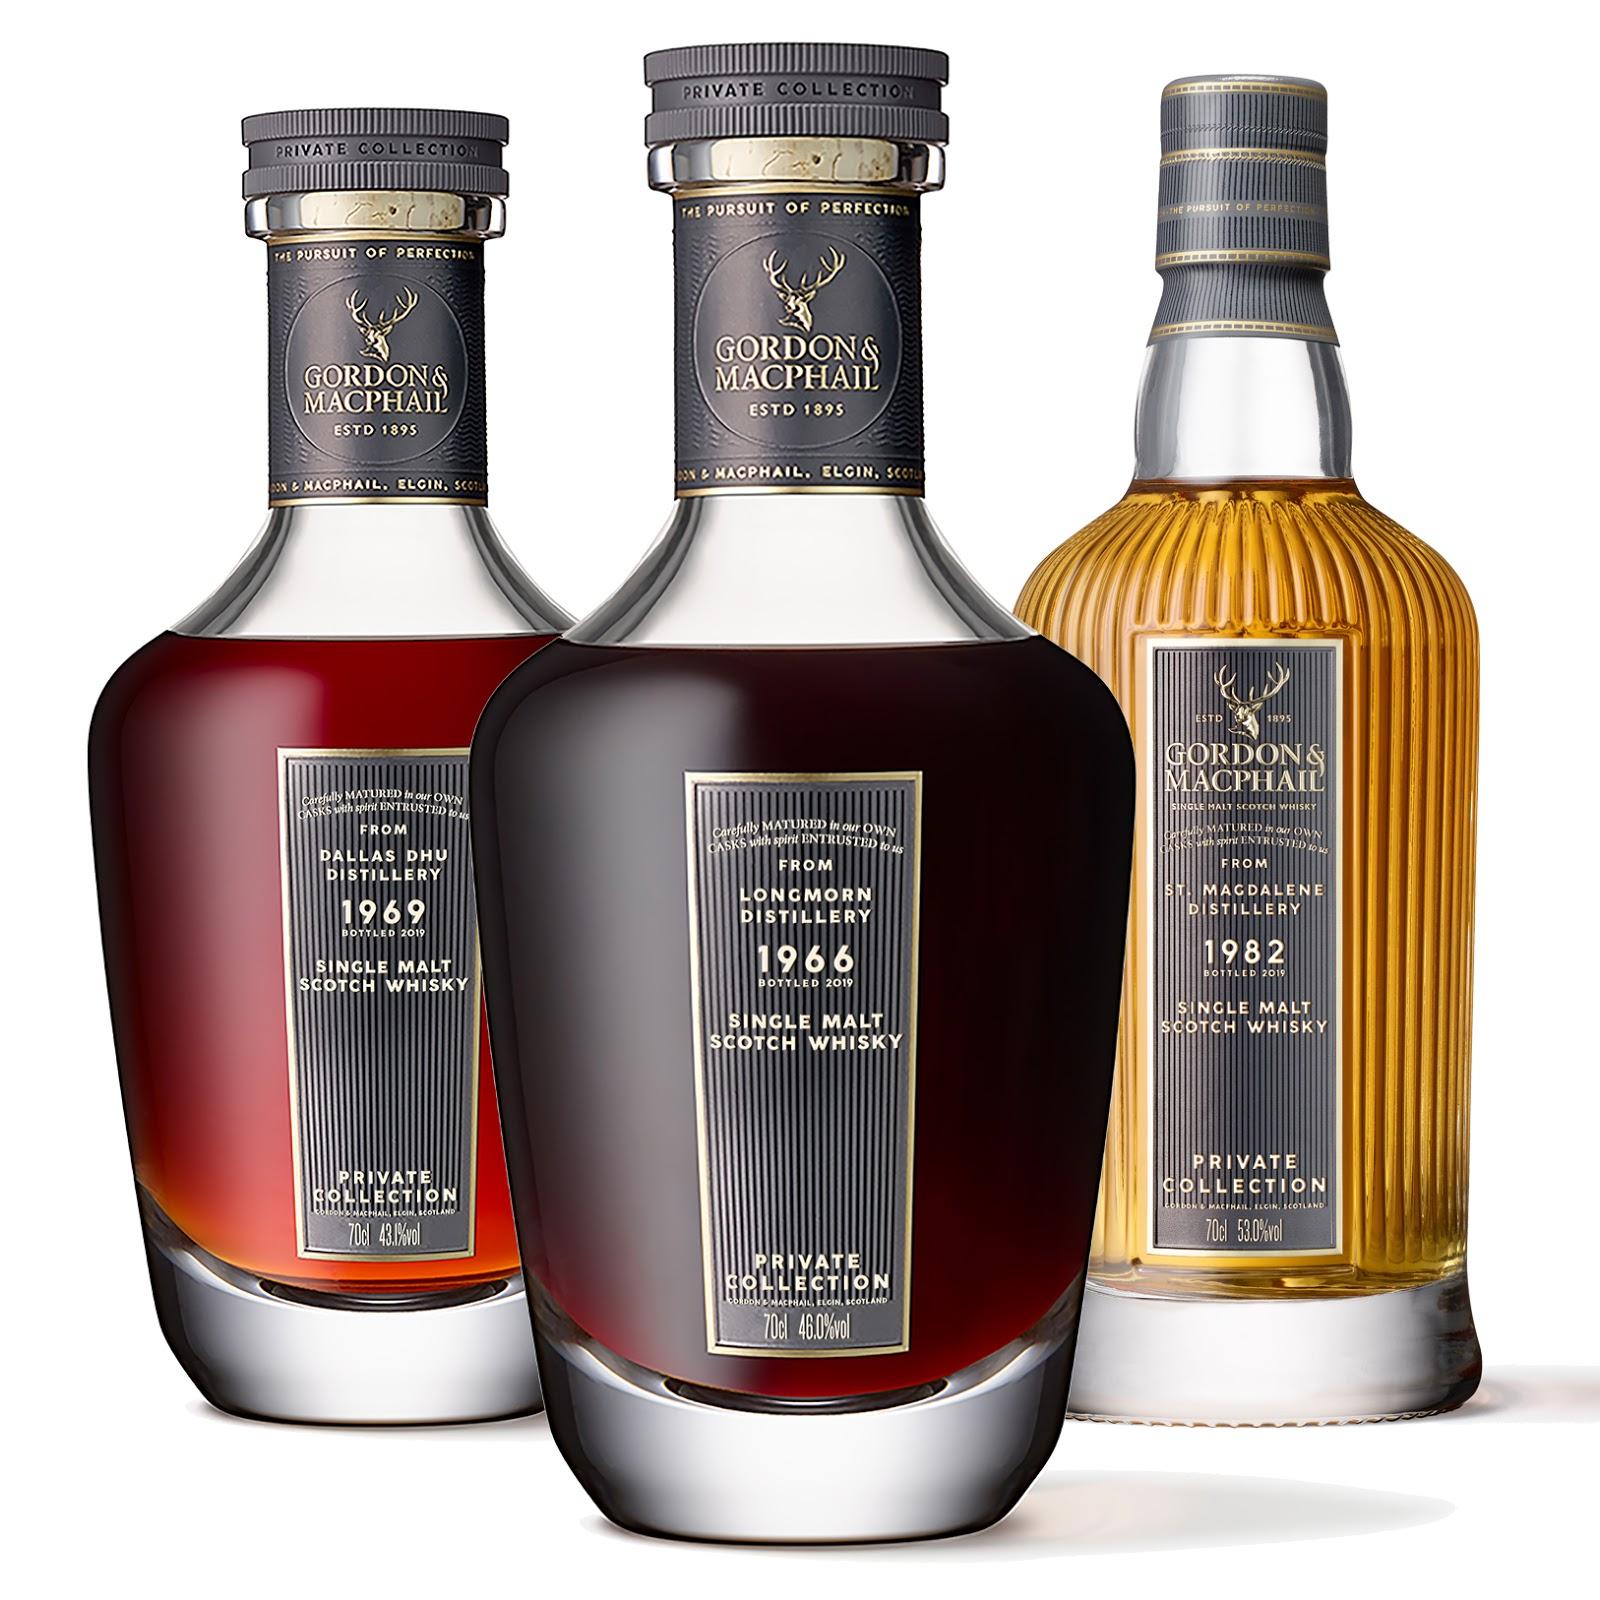 Time for Whisky.com